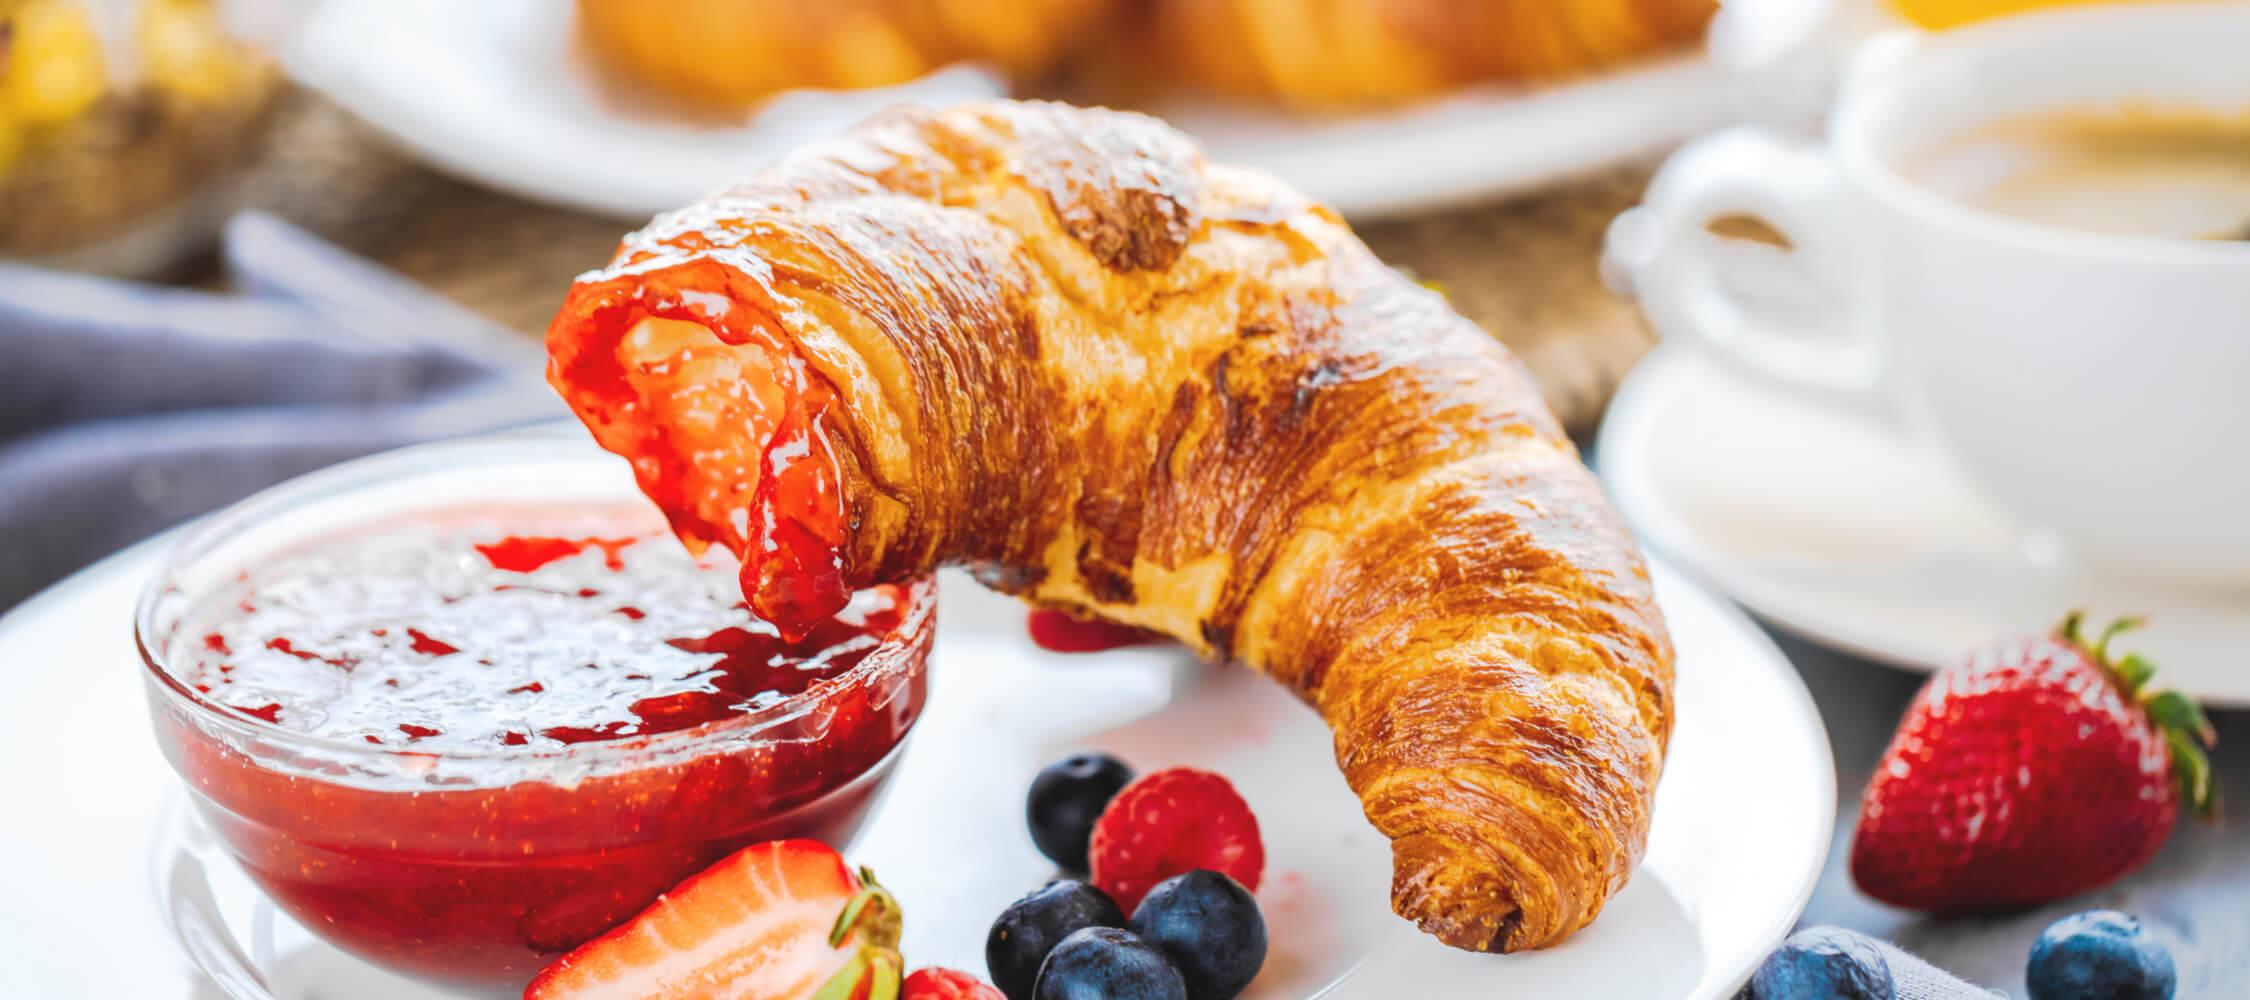 Hotel-Villa-Laurus-Merano-Restaurant-Breakfast-Buffet-Fruehstueck-Essen-Kuchen-193950425_L-2250x1000